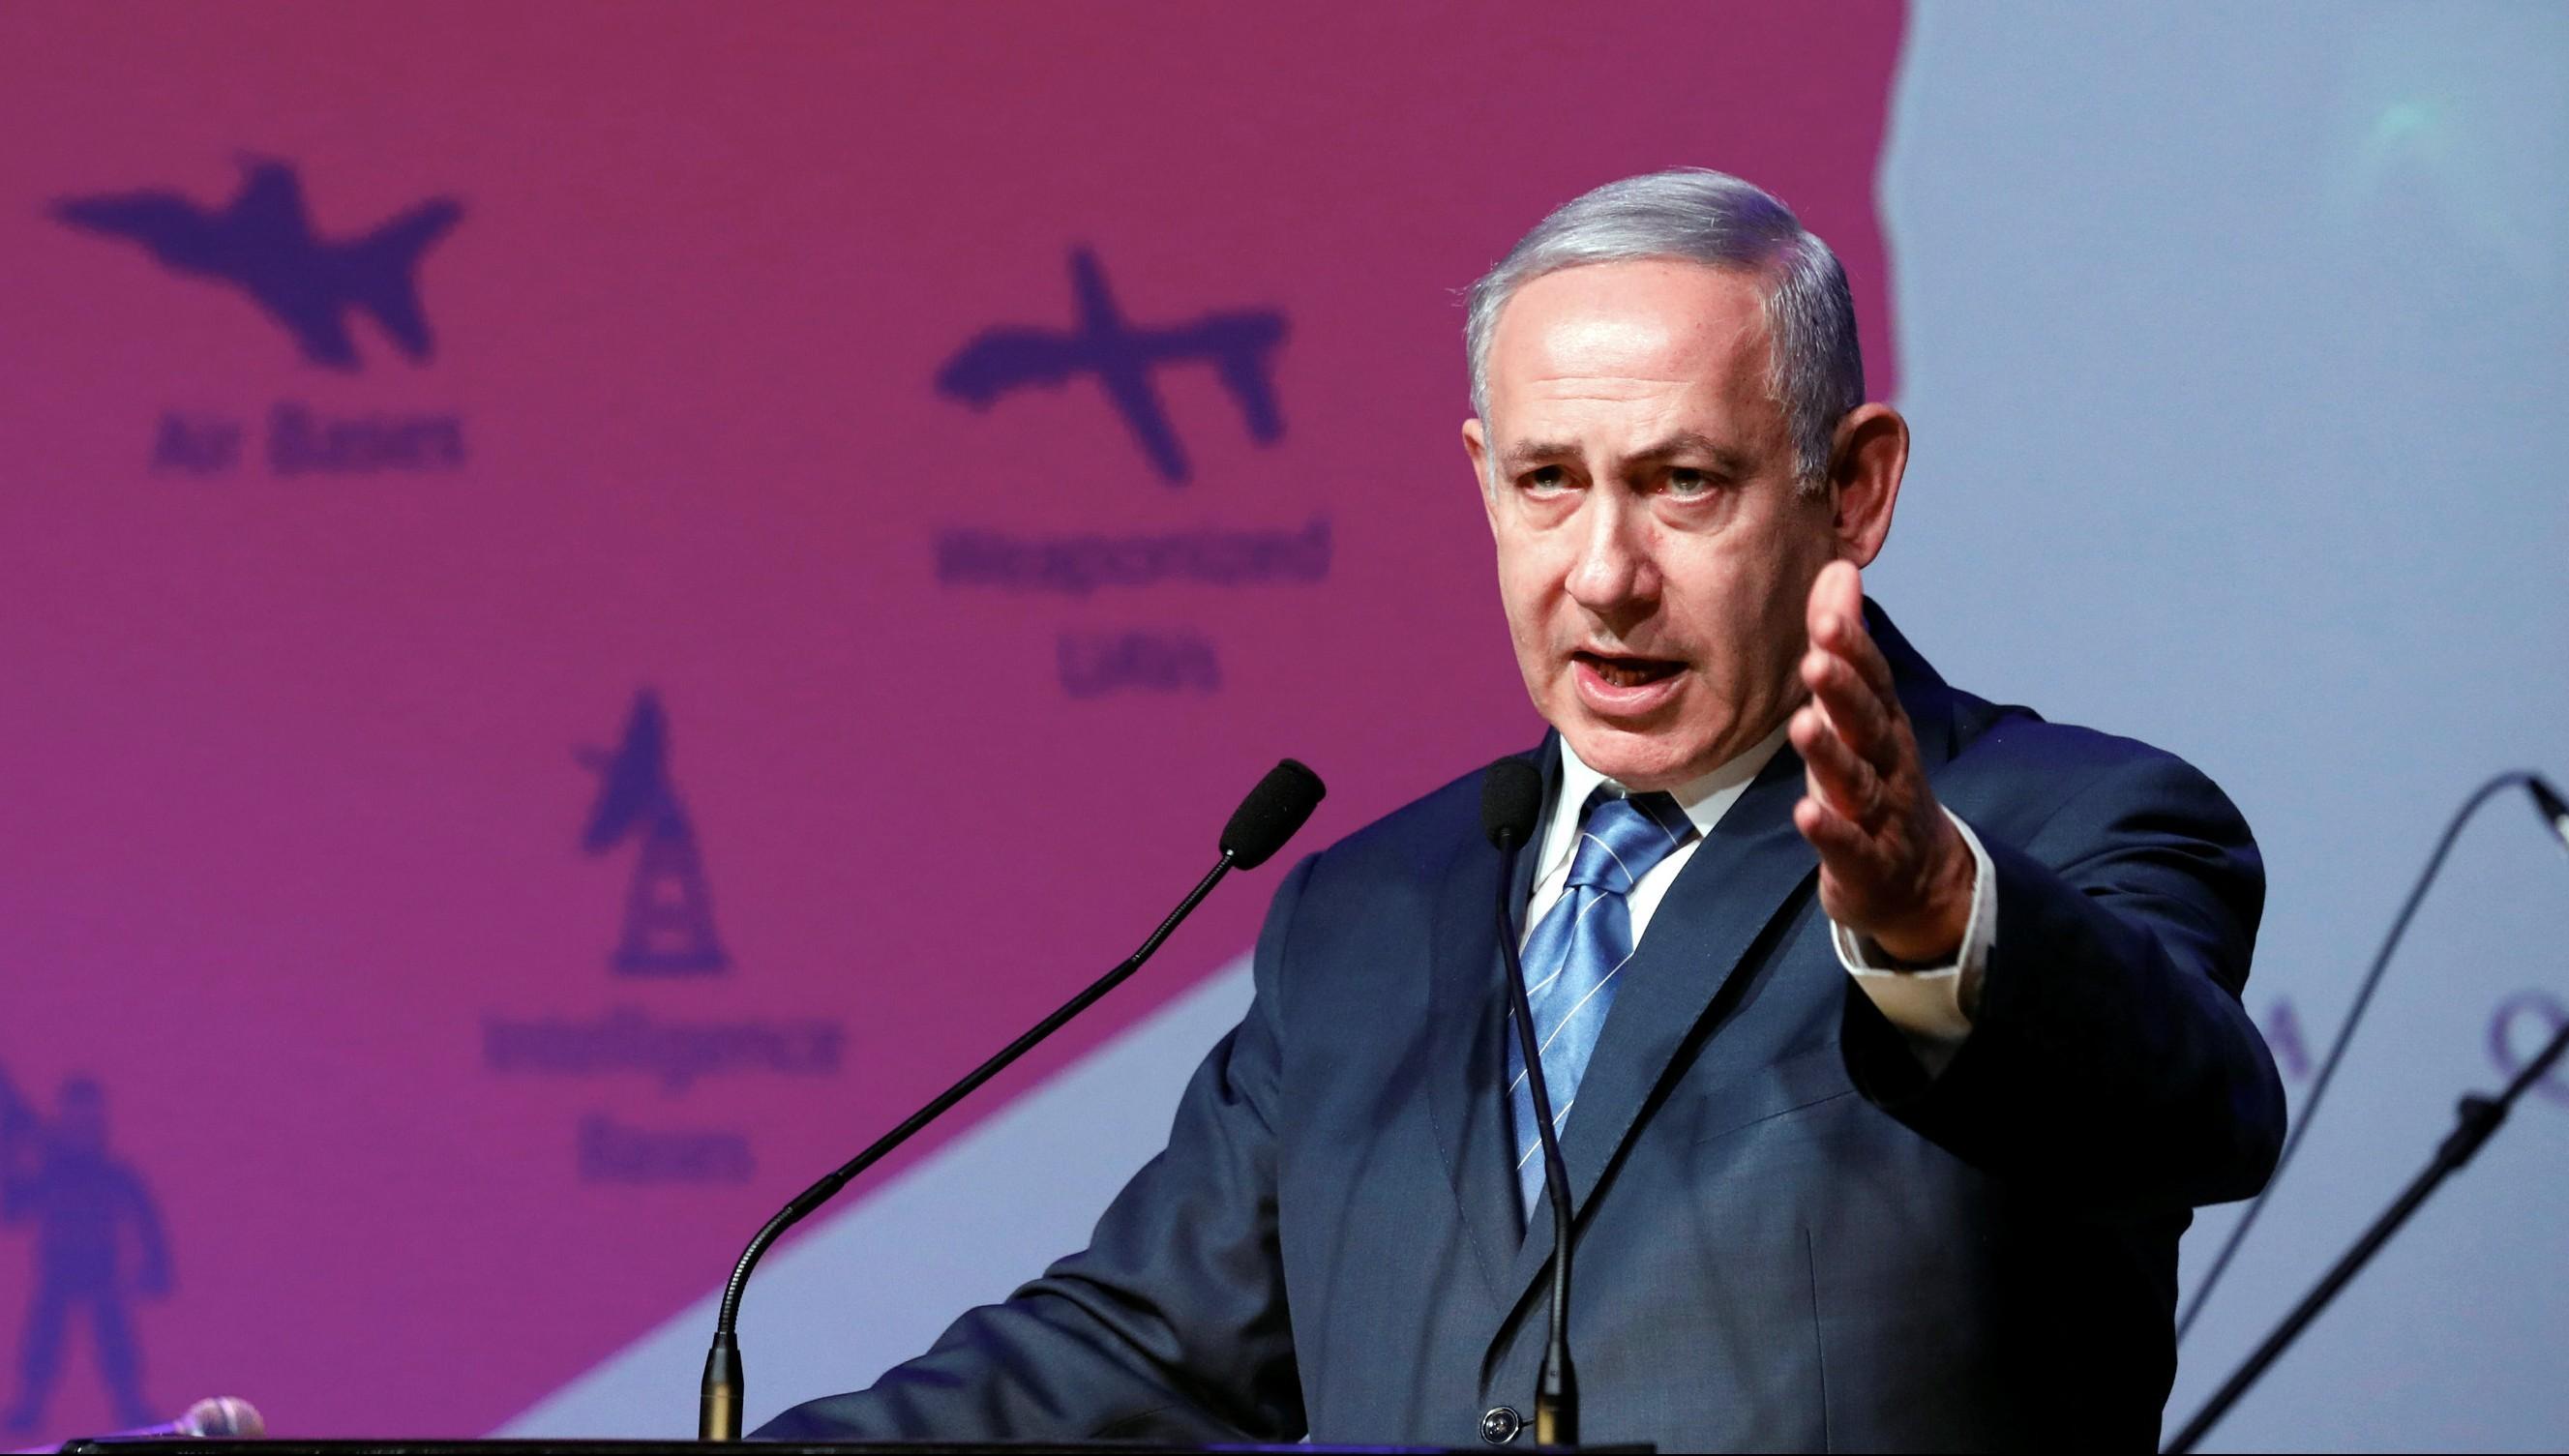 Benjamin Netanyahu (REUTERS/Amir Cohen)